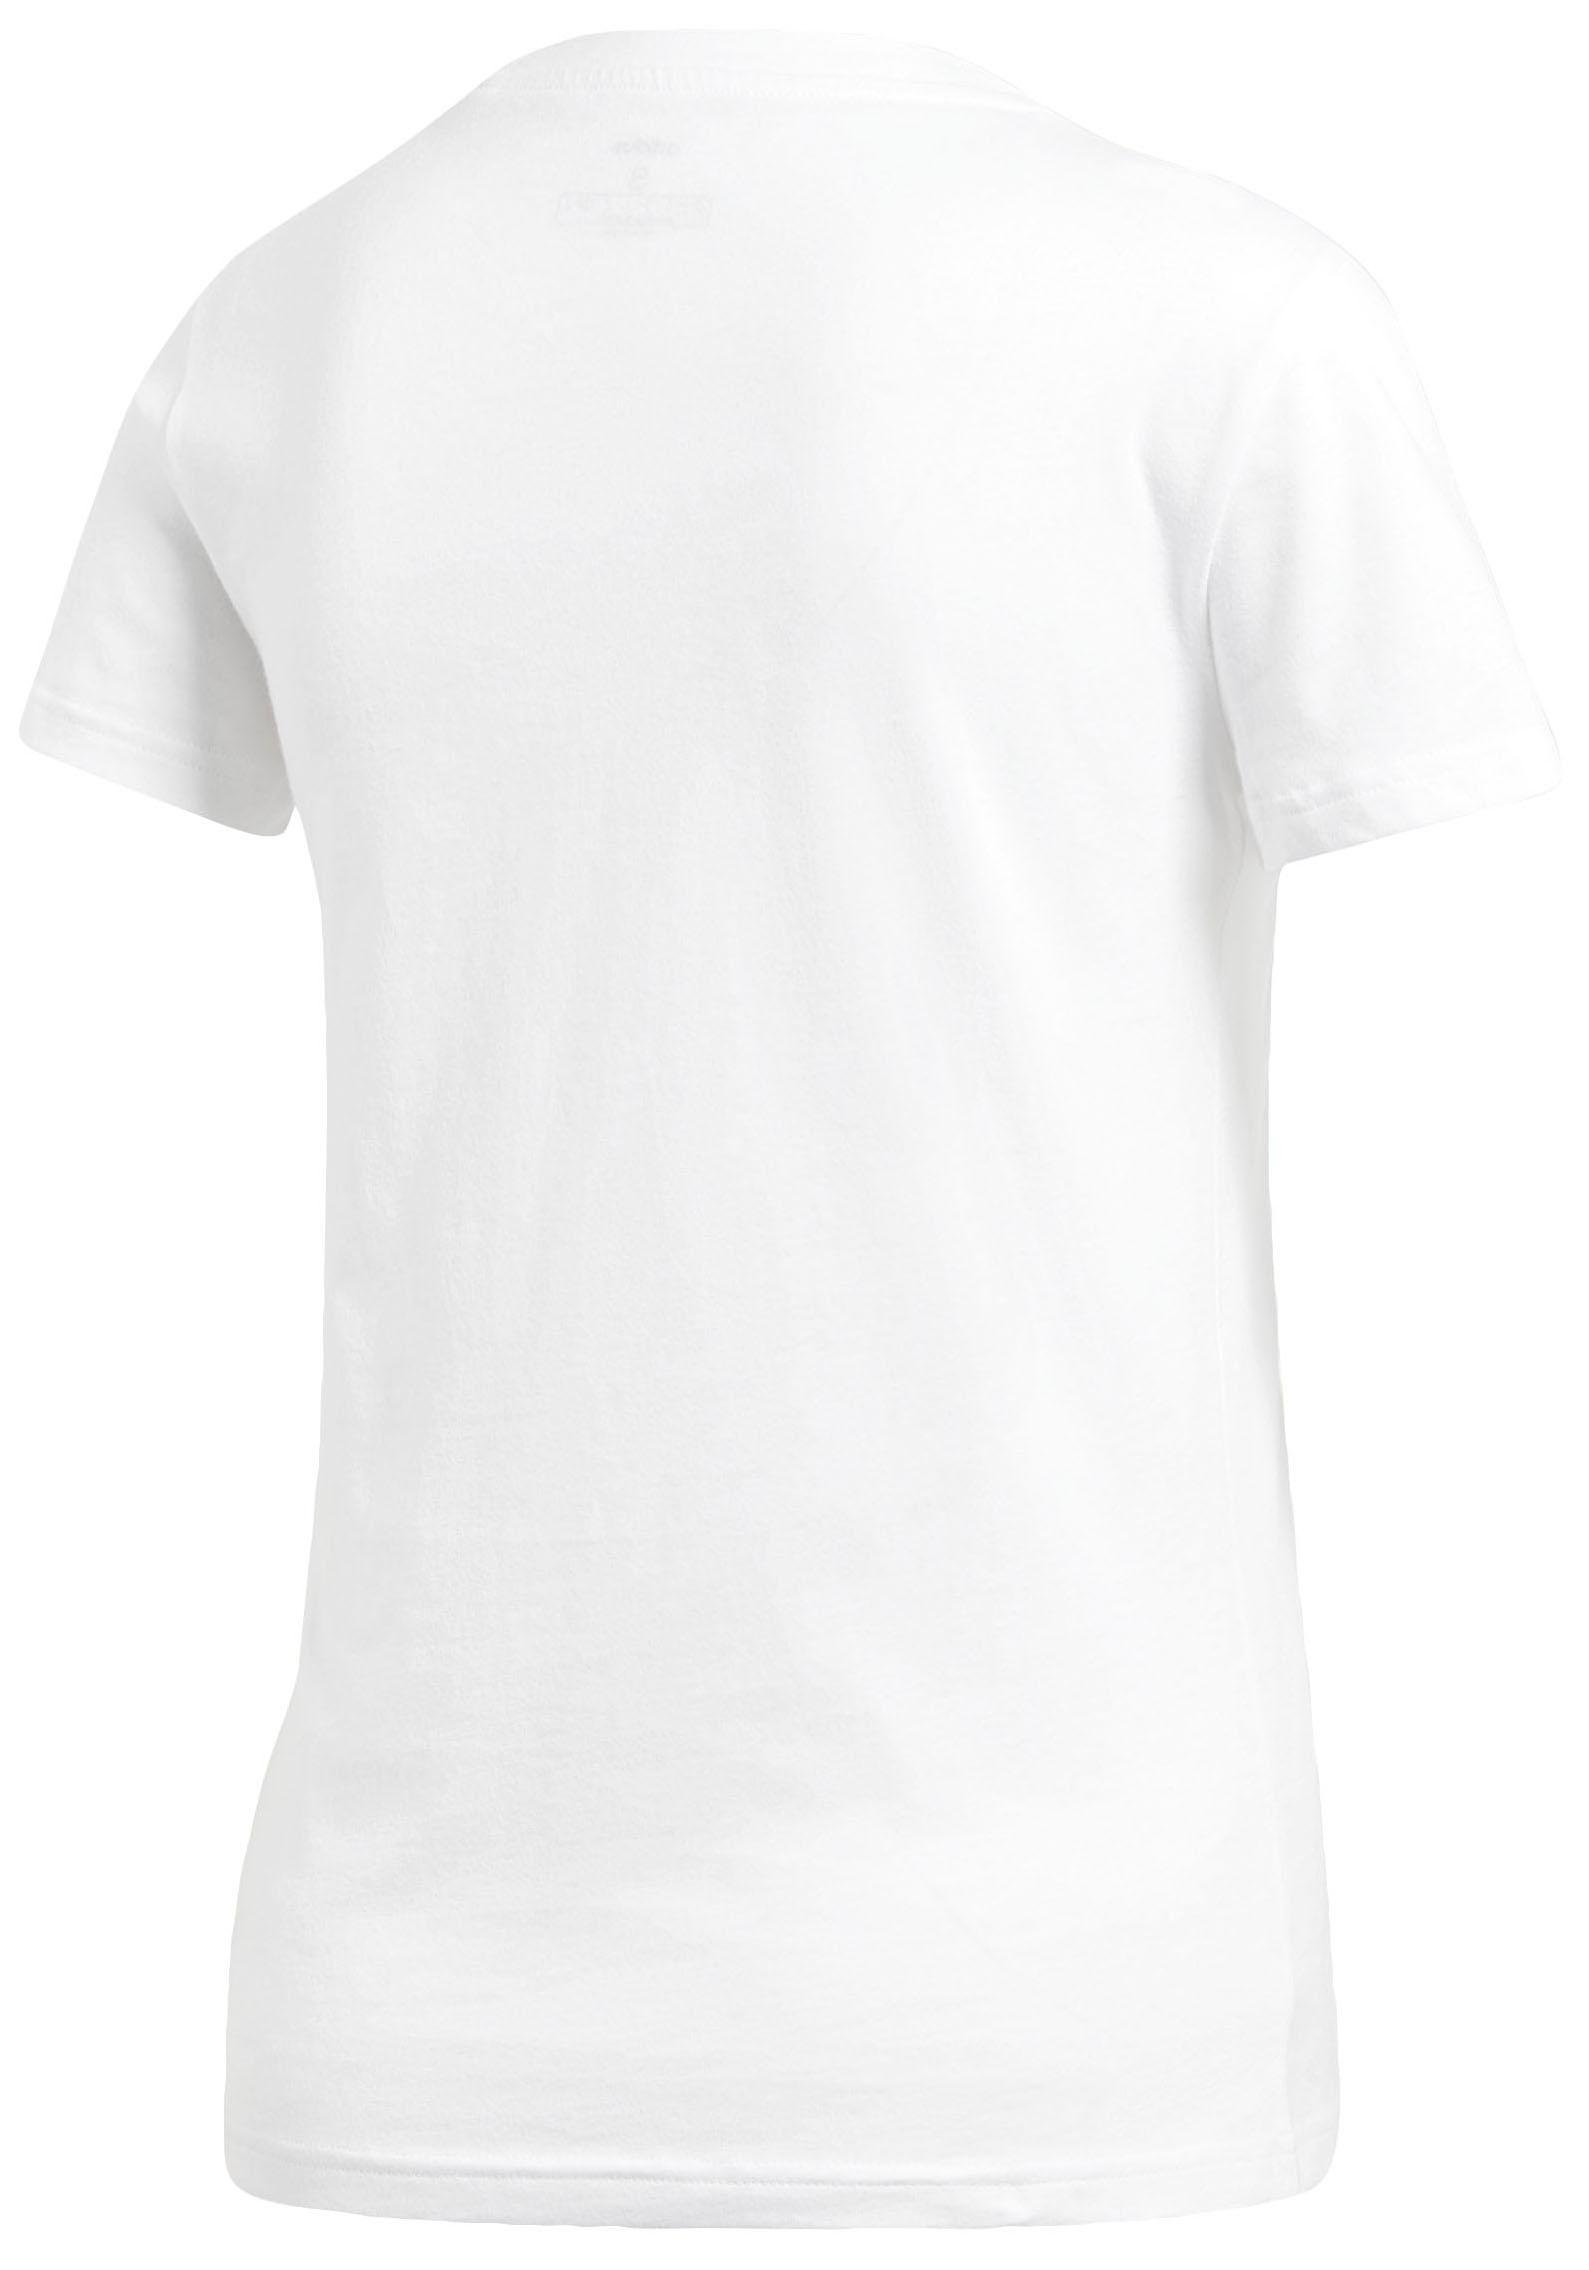 Adidas T Tee shirte Shoppen Slim Linear Online Yfyb67g